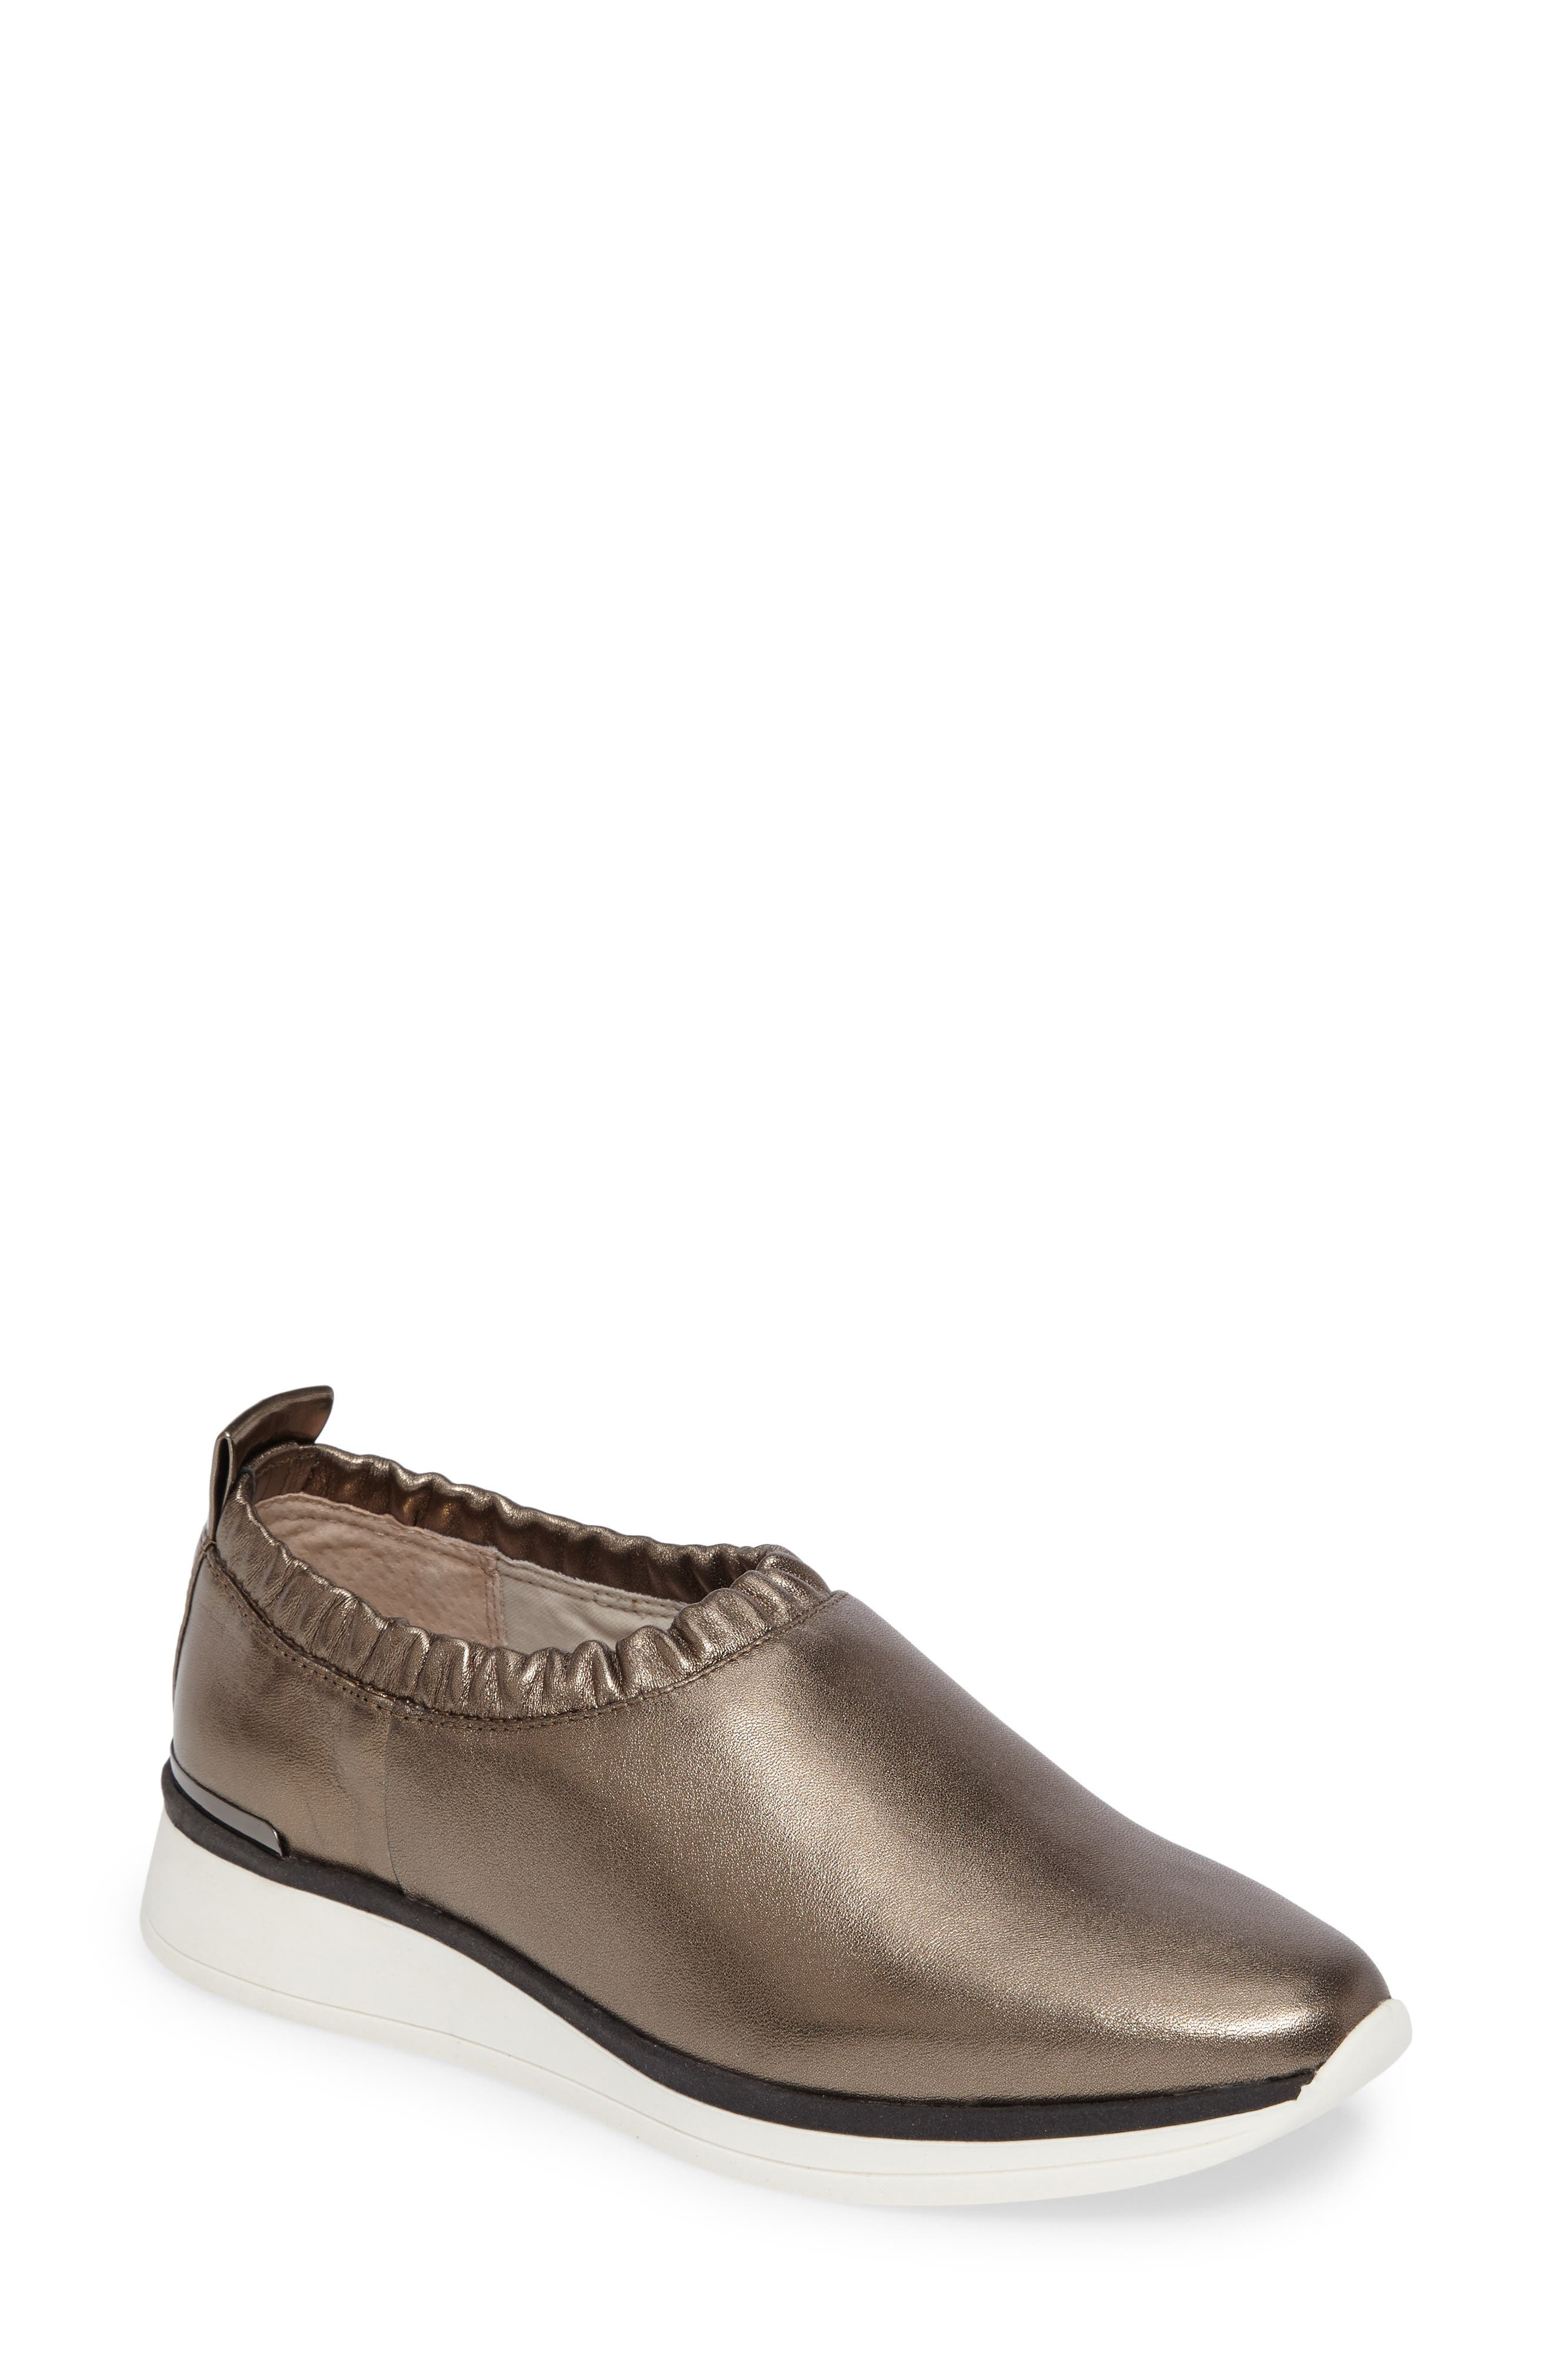 Brogen Slip-On Sneaker,                         Main,                         color, Platina Leather